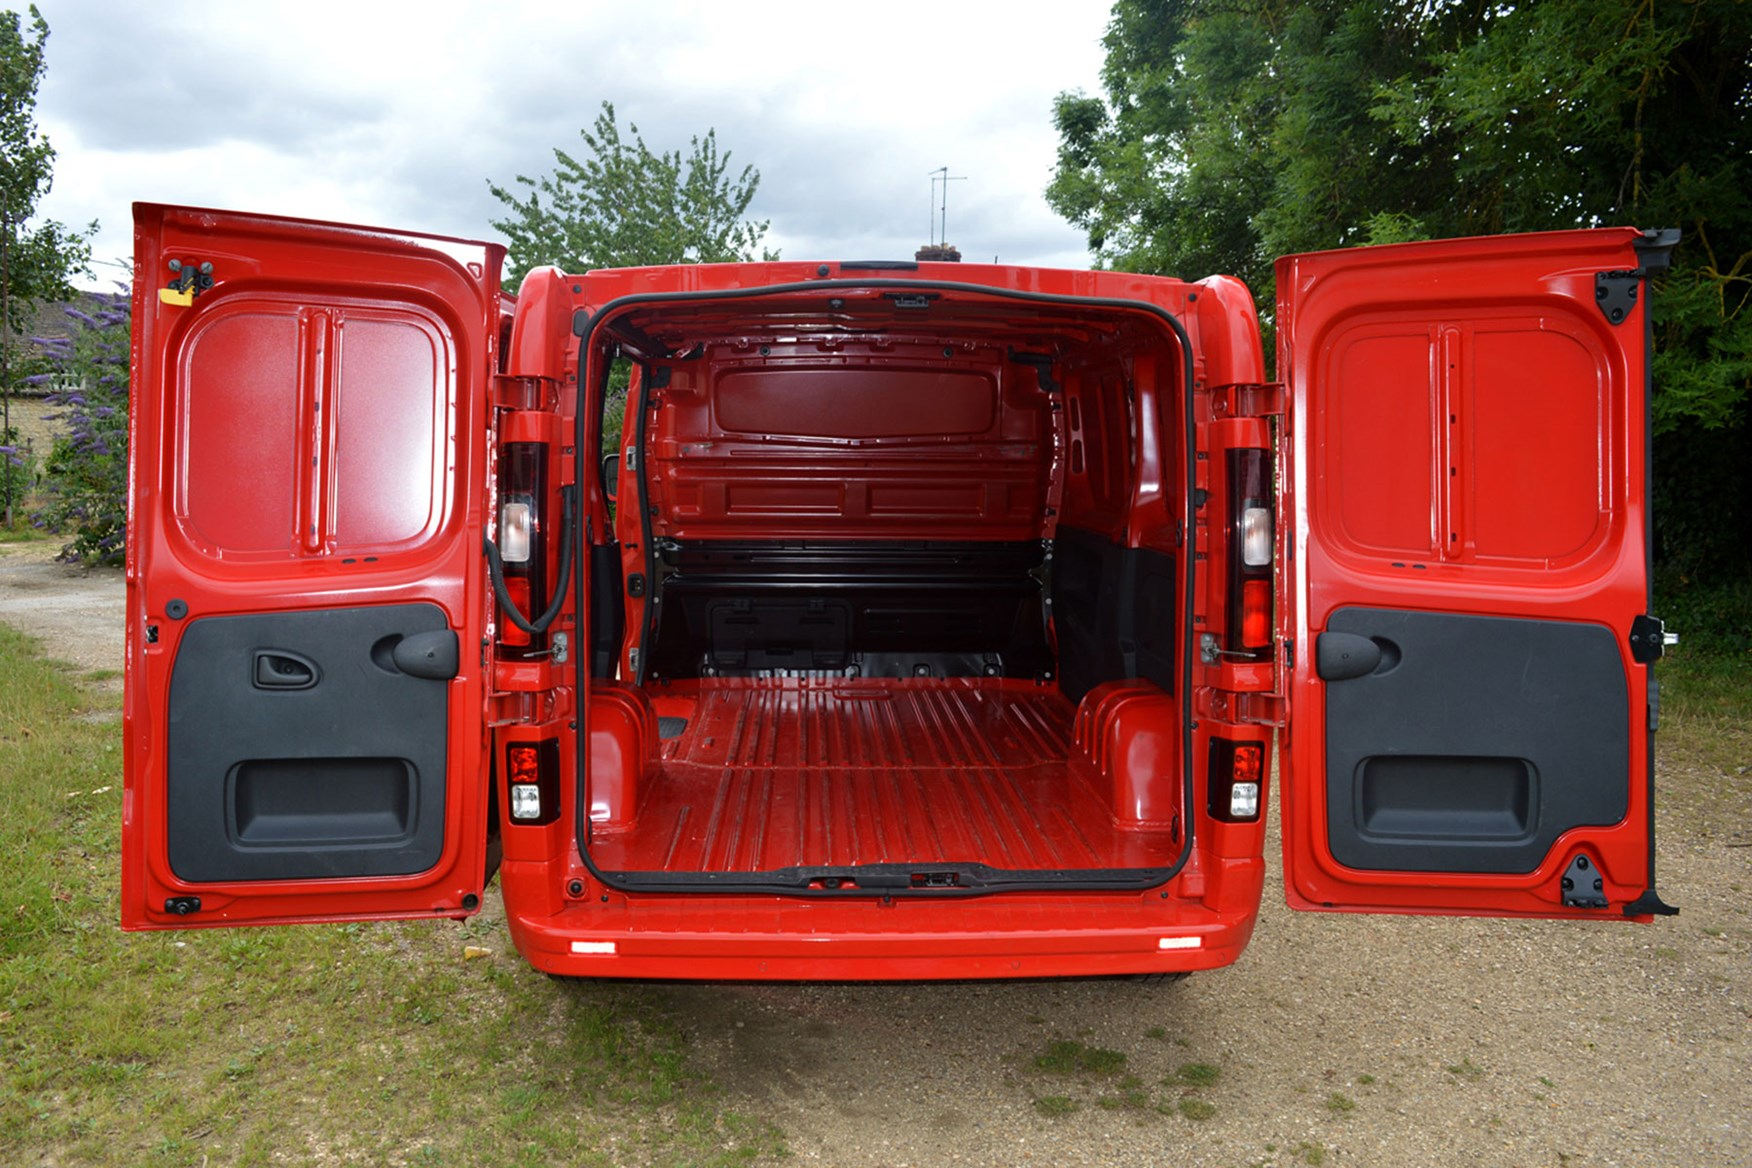 Vauxhall Vivaro Sportive EU5 review - load area